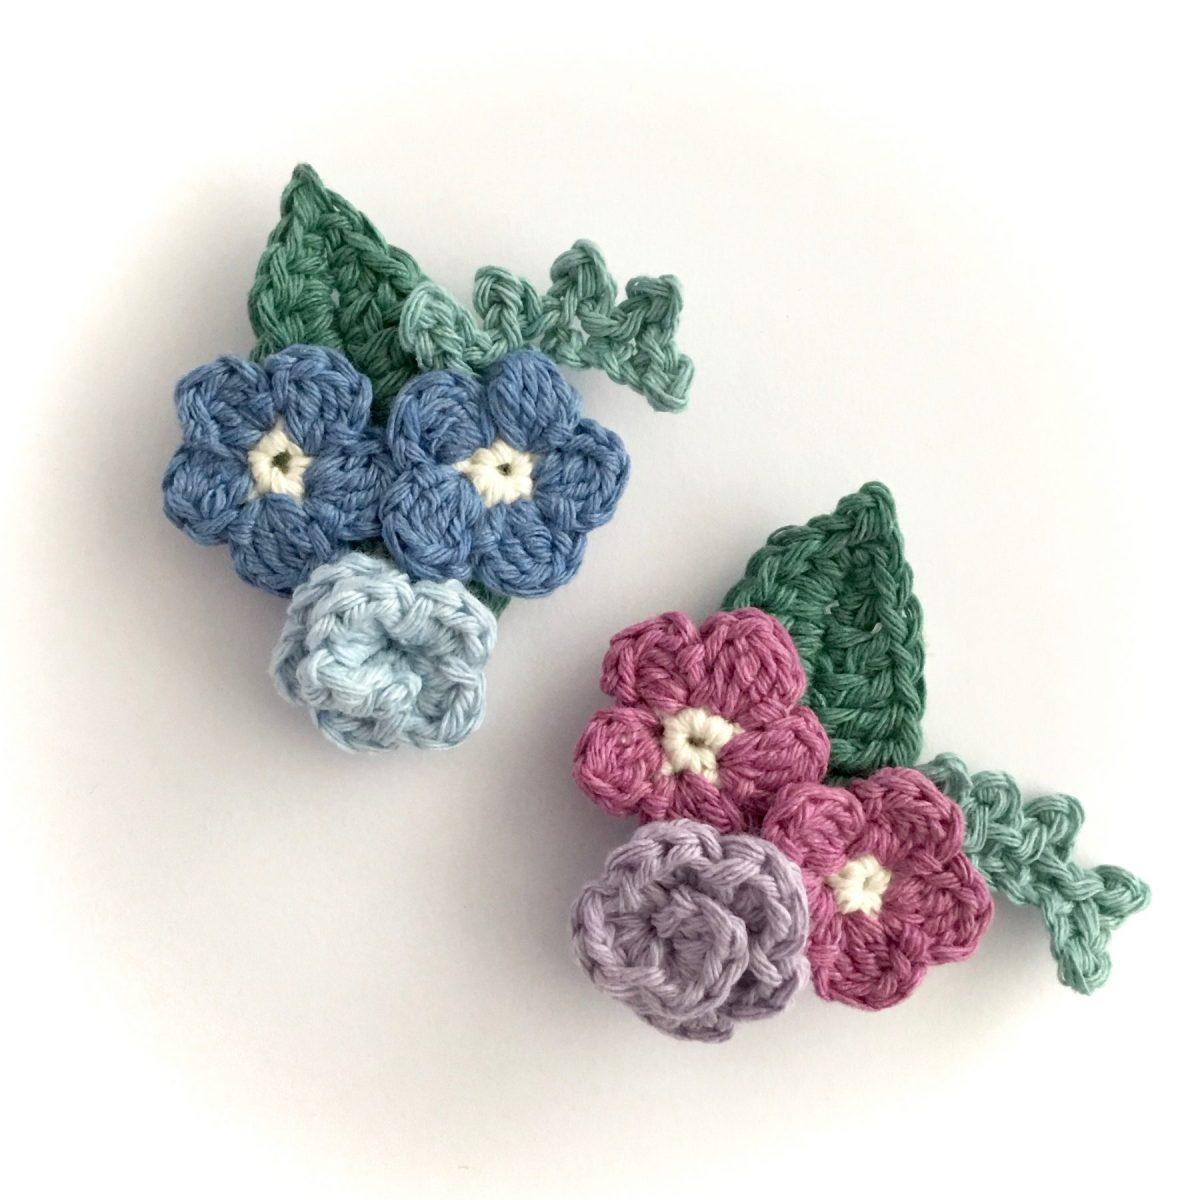 Crocheted Brooches Crochet Flowers Bouquet Brooch